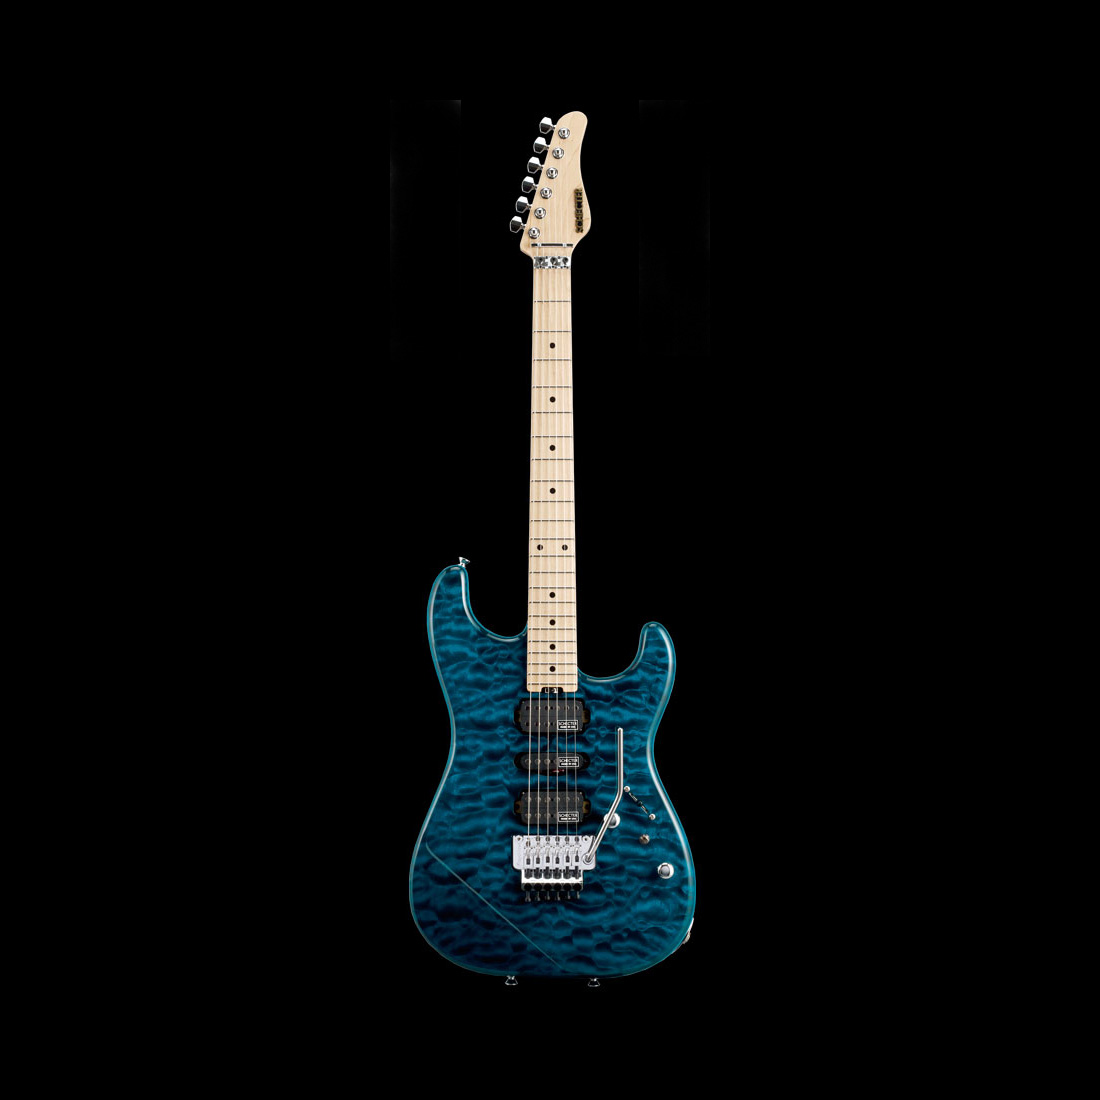 Schecter / ST-V-CTM-FRT M/NPG Black Aqua シェクター エレキギター 《受注生産:予約受付中》